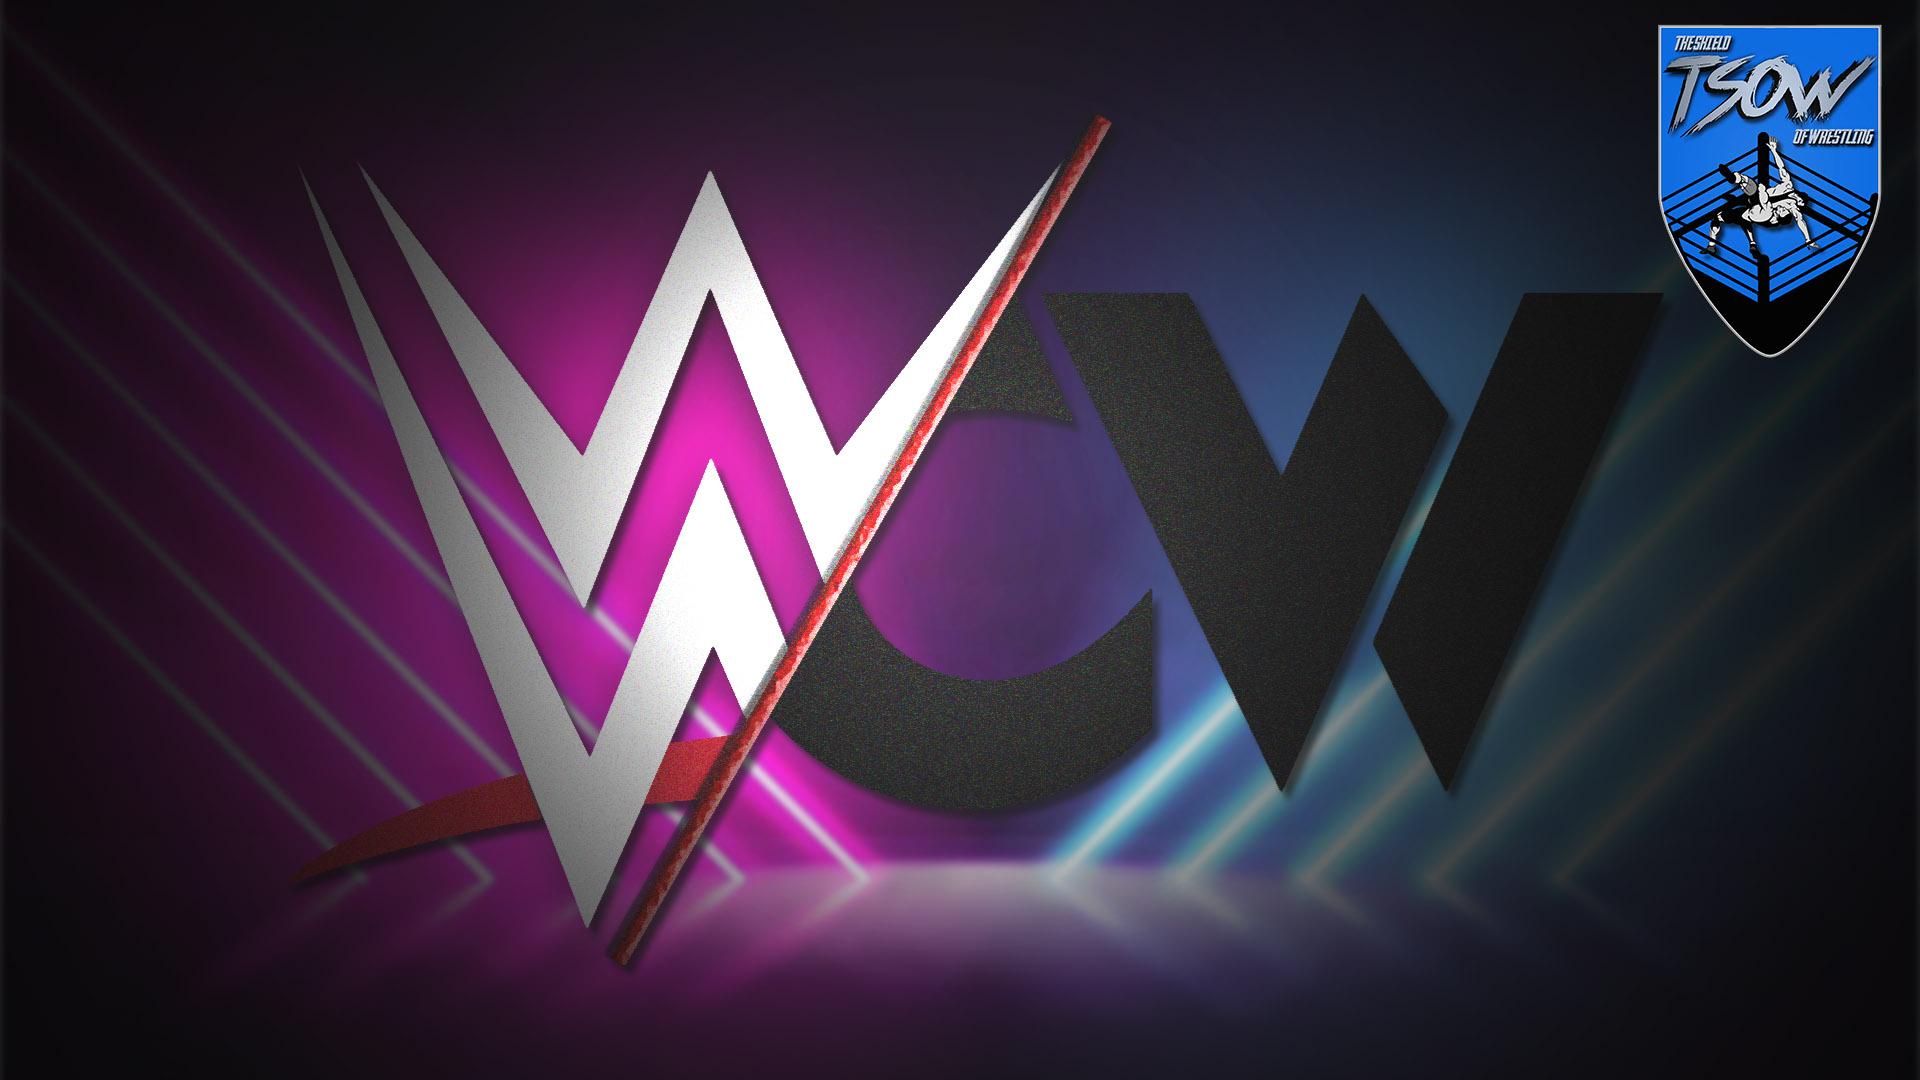 La WWE è la nuova WCW?